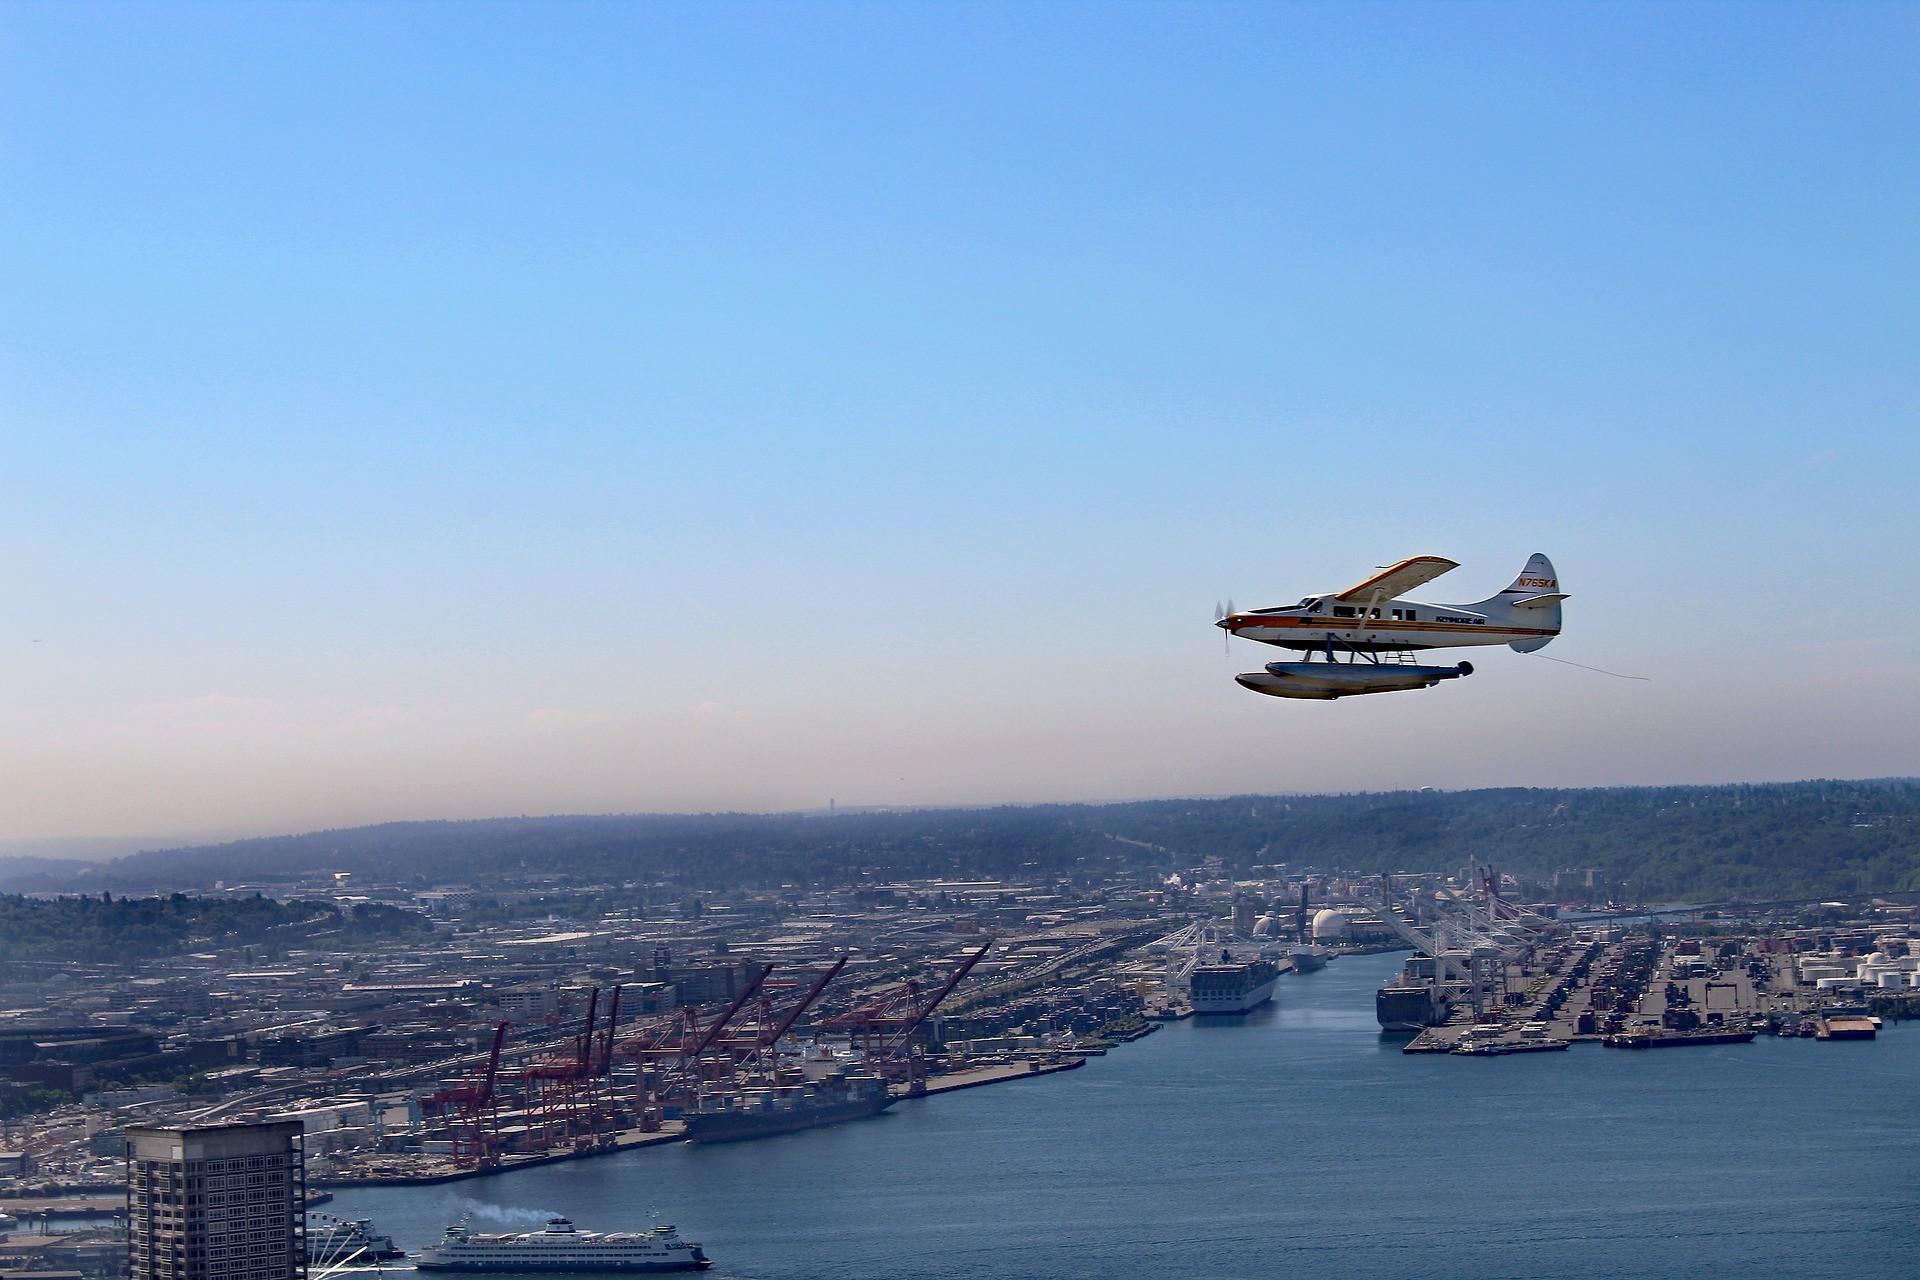 aircraft city view